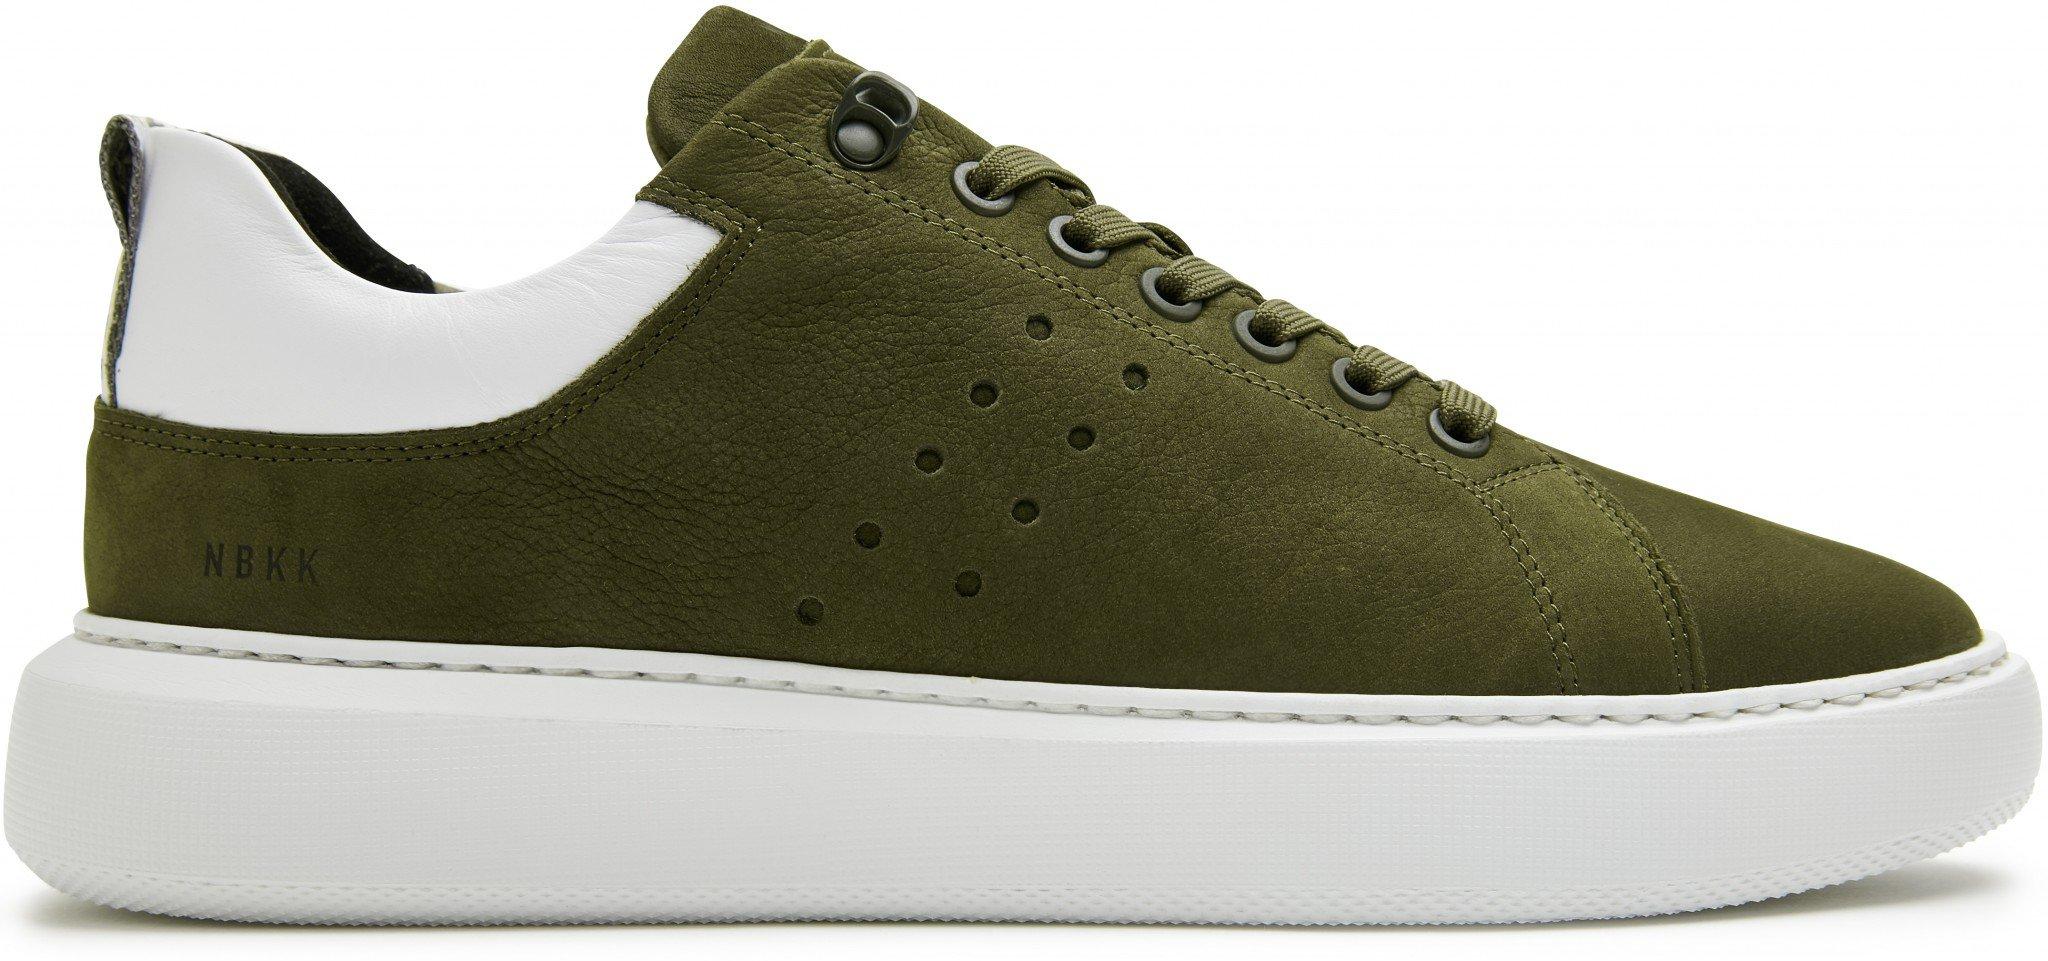 2ab8a3d4b79 Scott Nubuck | Groene Sneaker